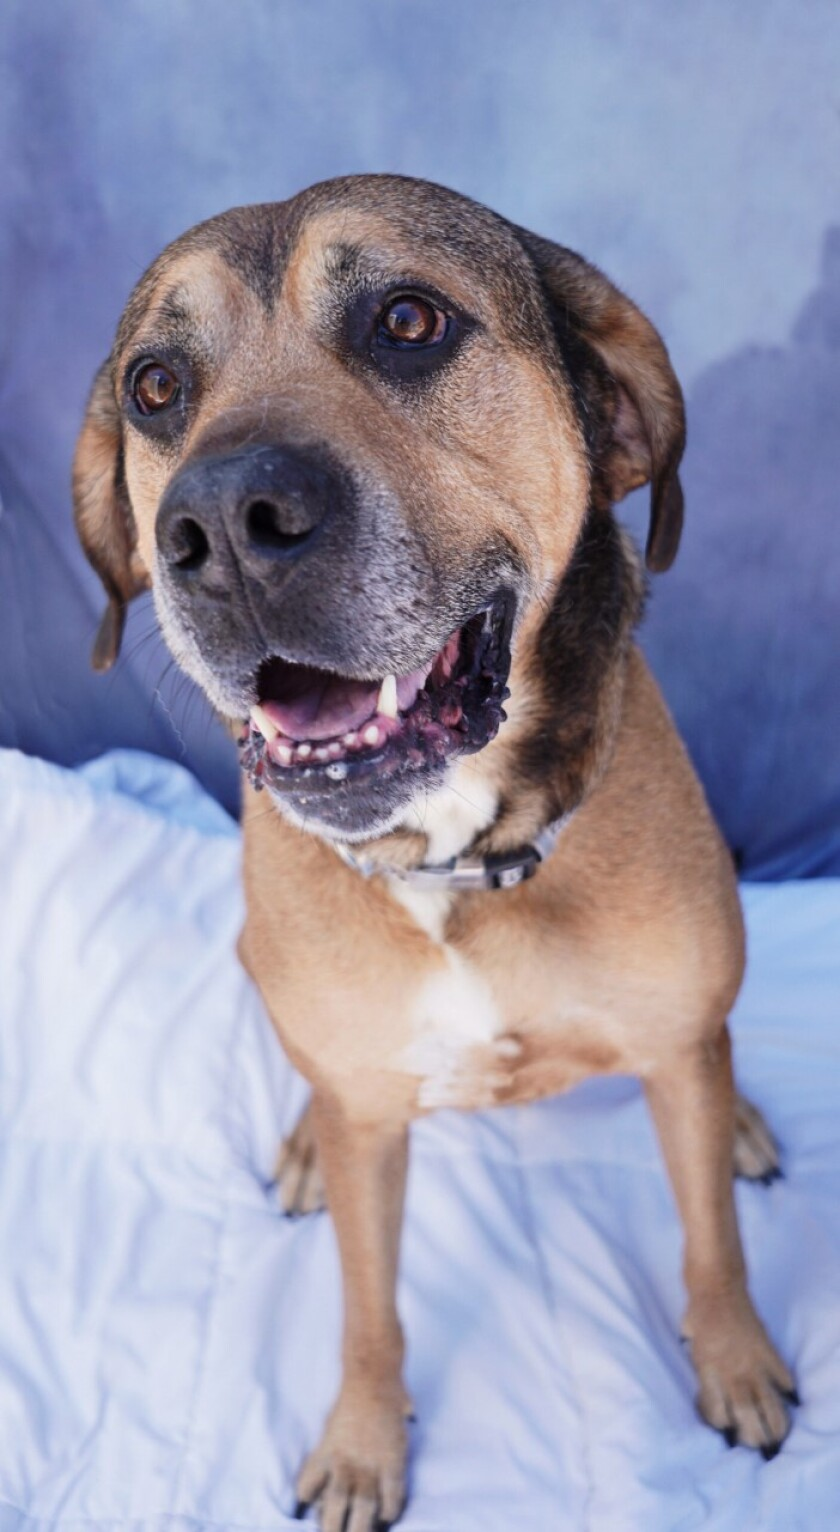 Pet of the week is a friendly hound at Rancho Coastal Humane Society.